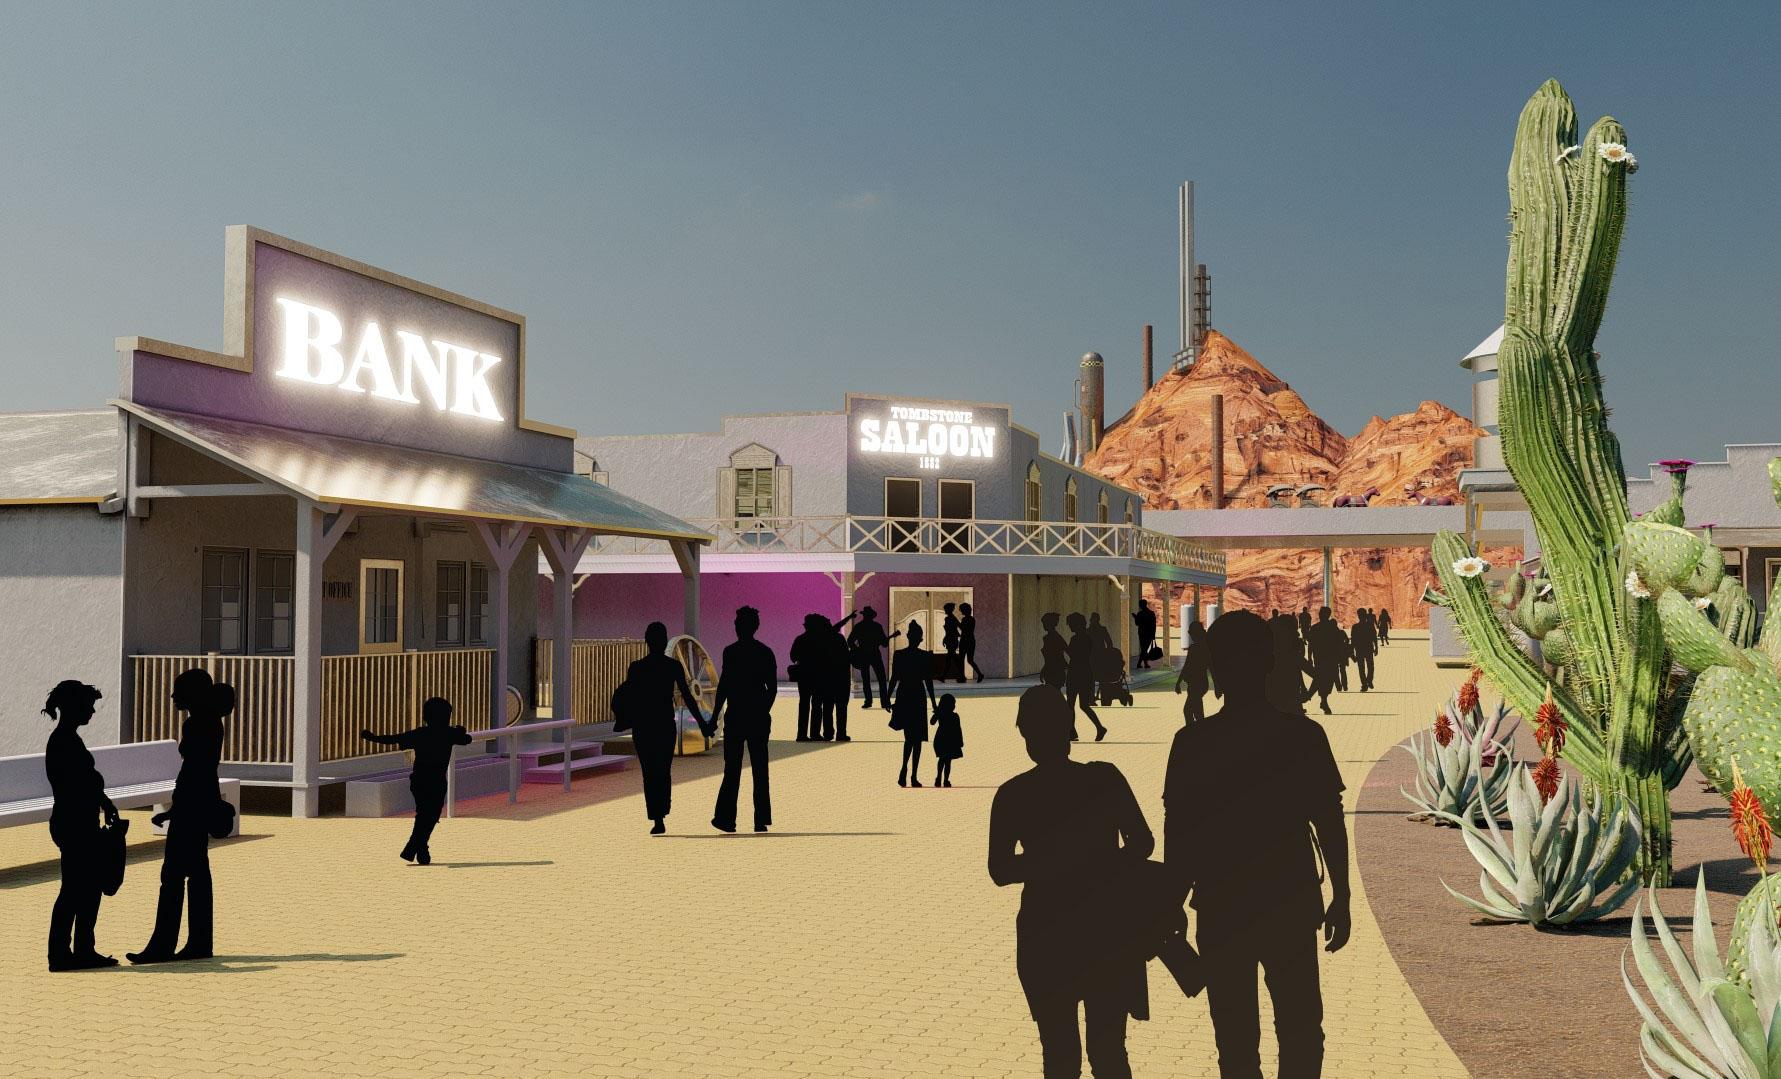 Tomorrowland Reimagine - Sci-Fi Western